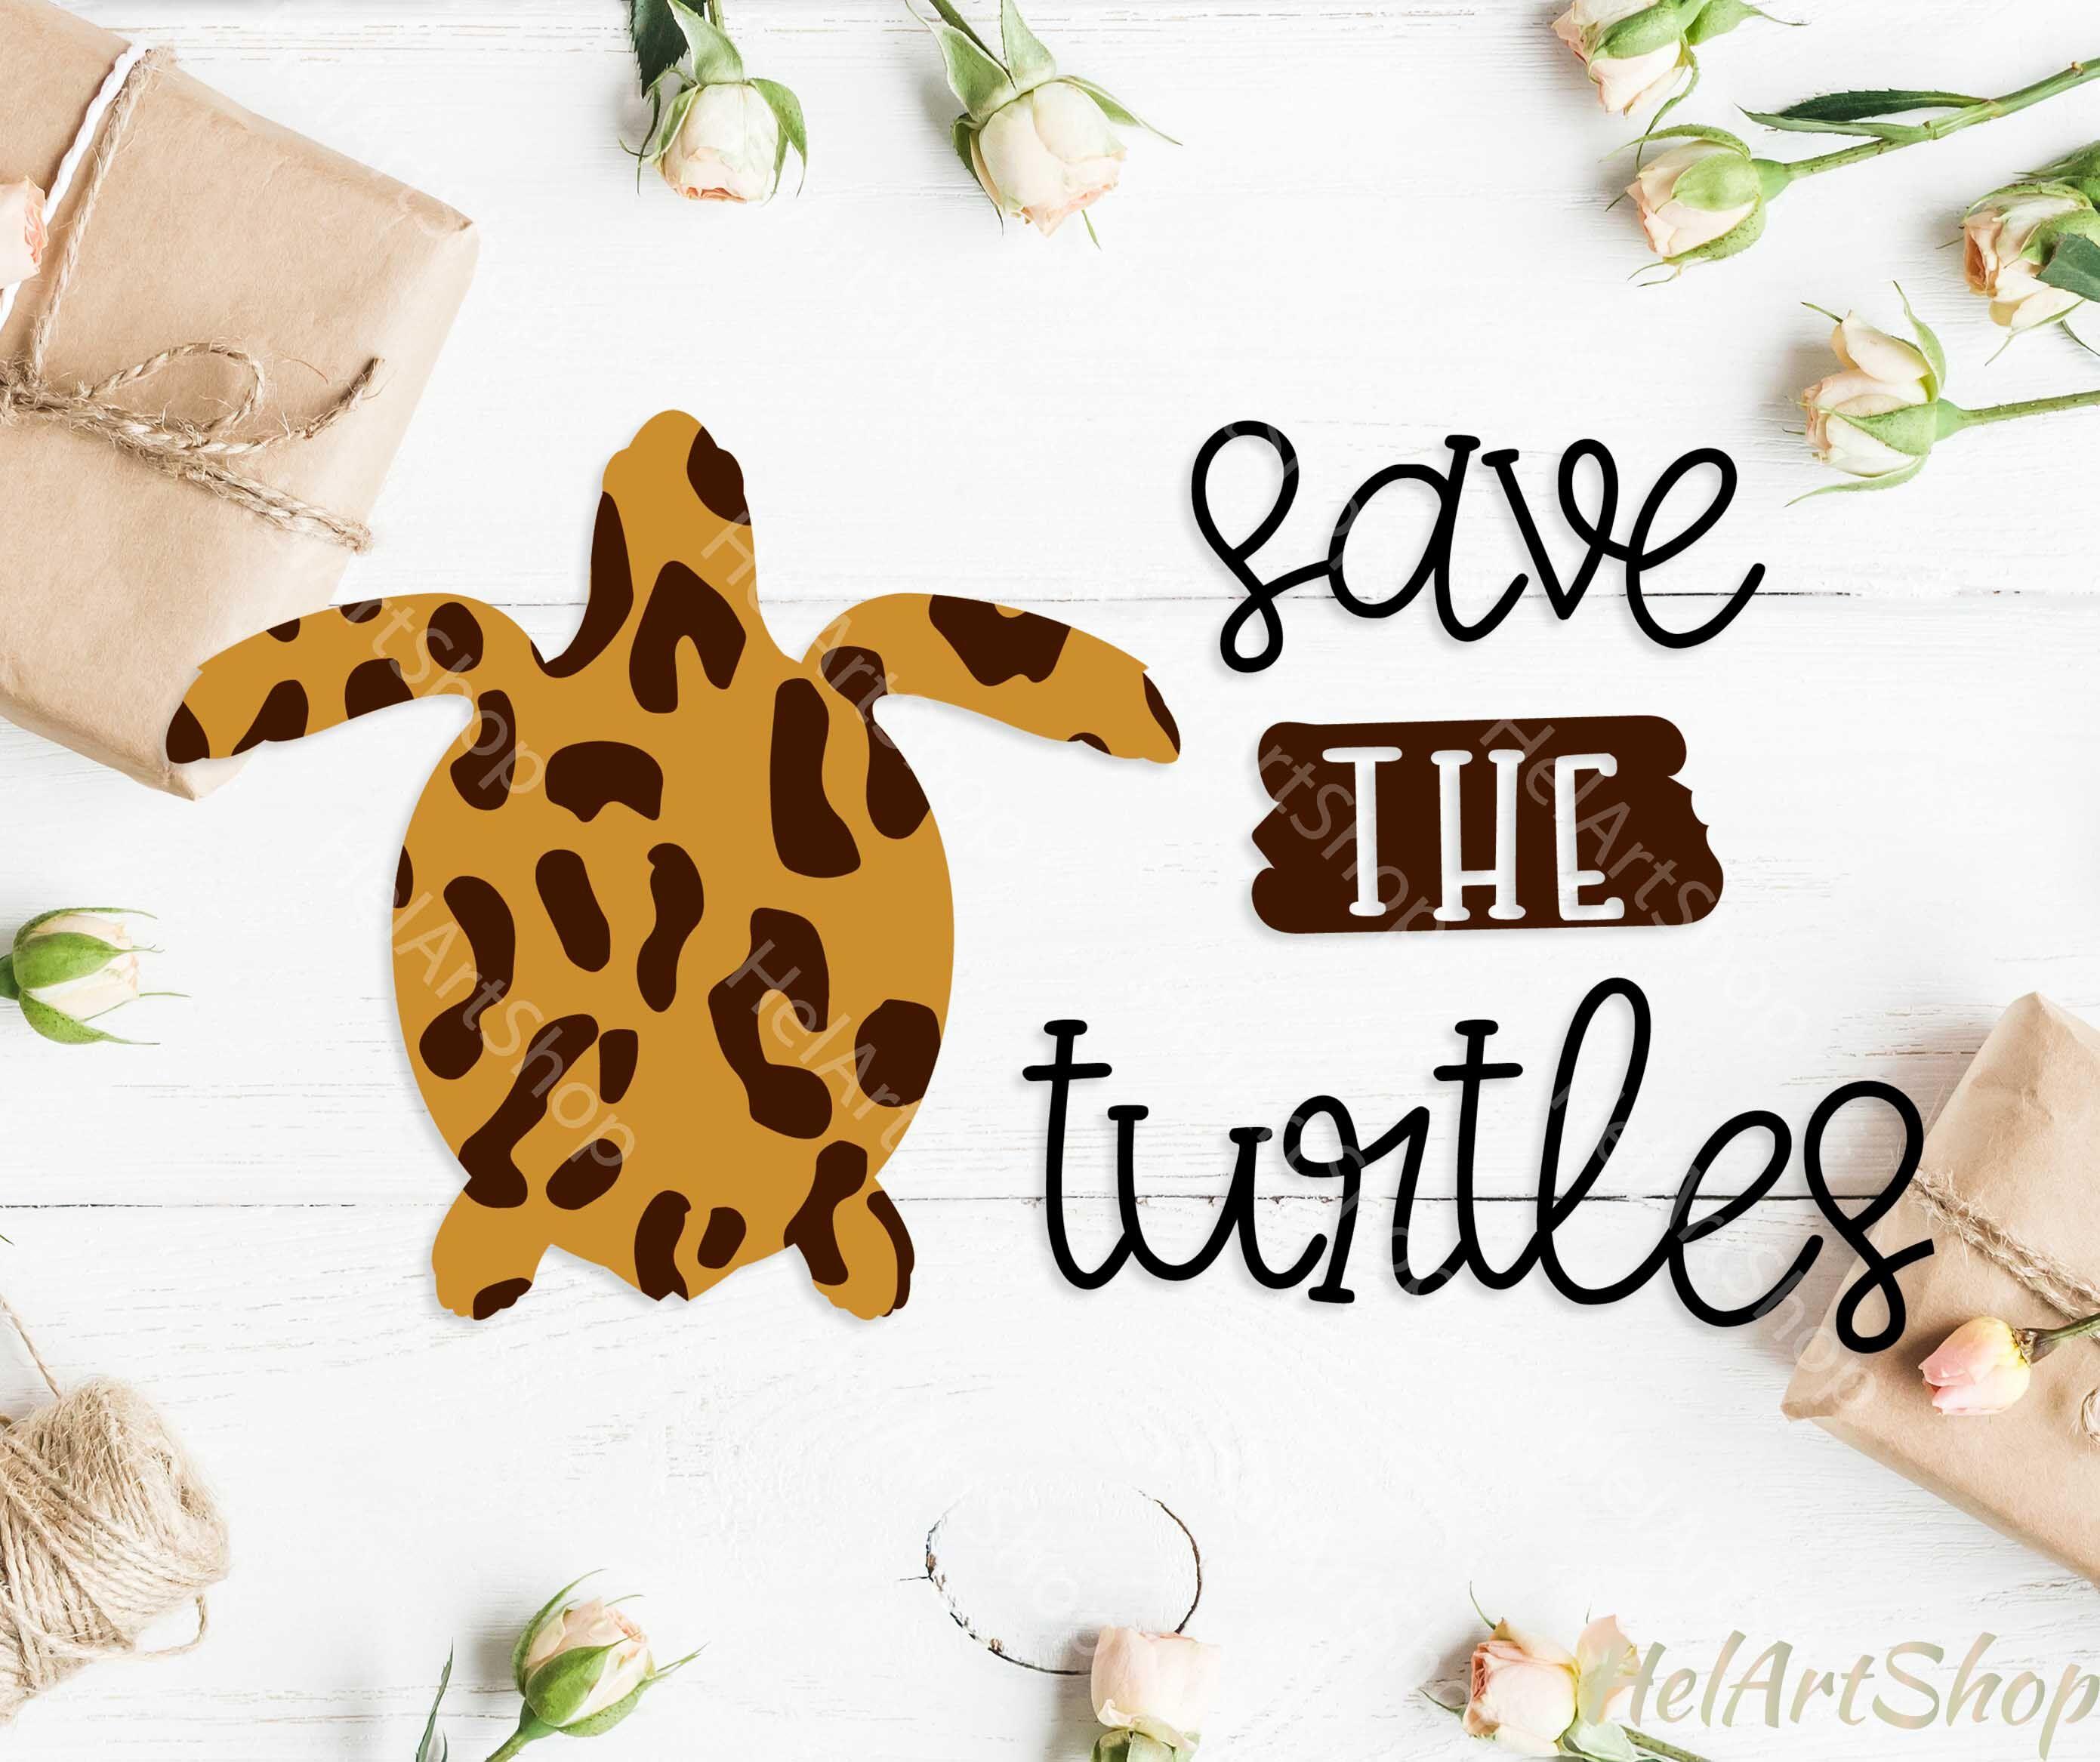 save the turtles svg vsco girl svg Downloadable Design File PNG and SVG Cut file! trending svg Is that a plastic straw svg